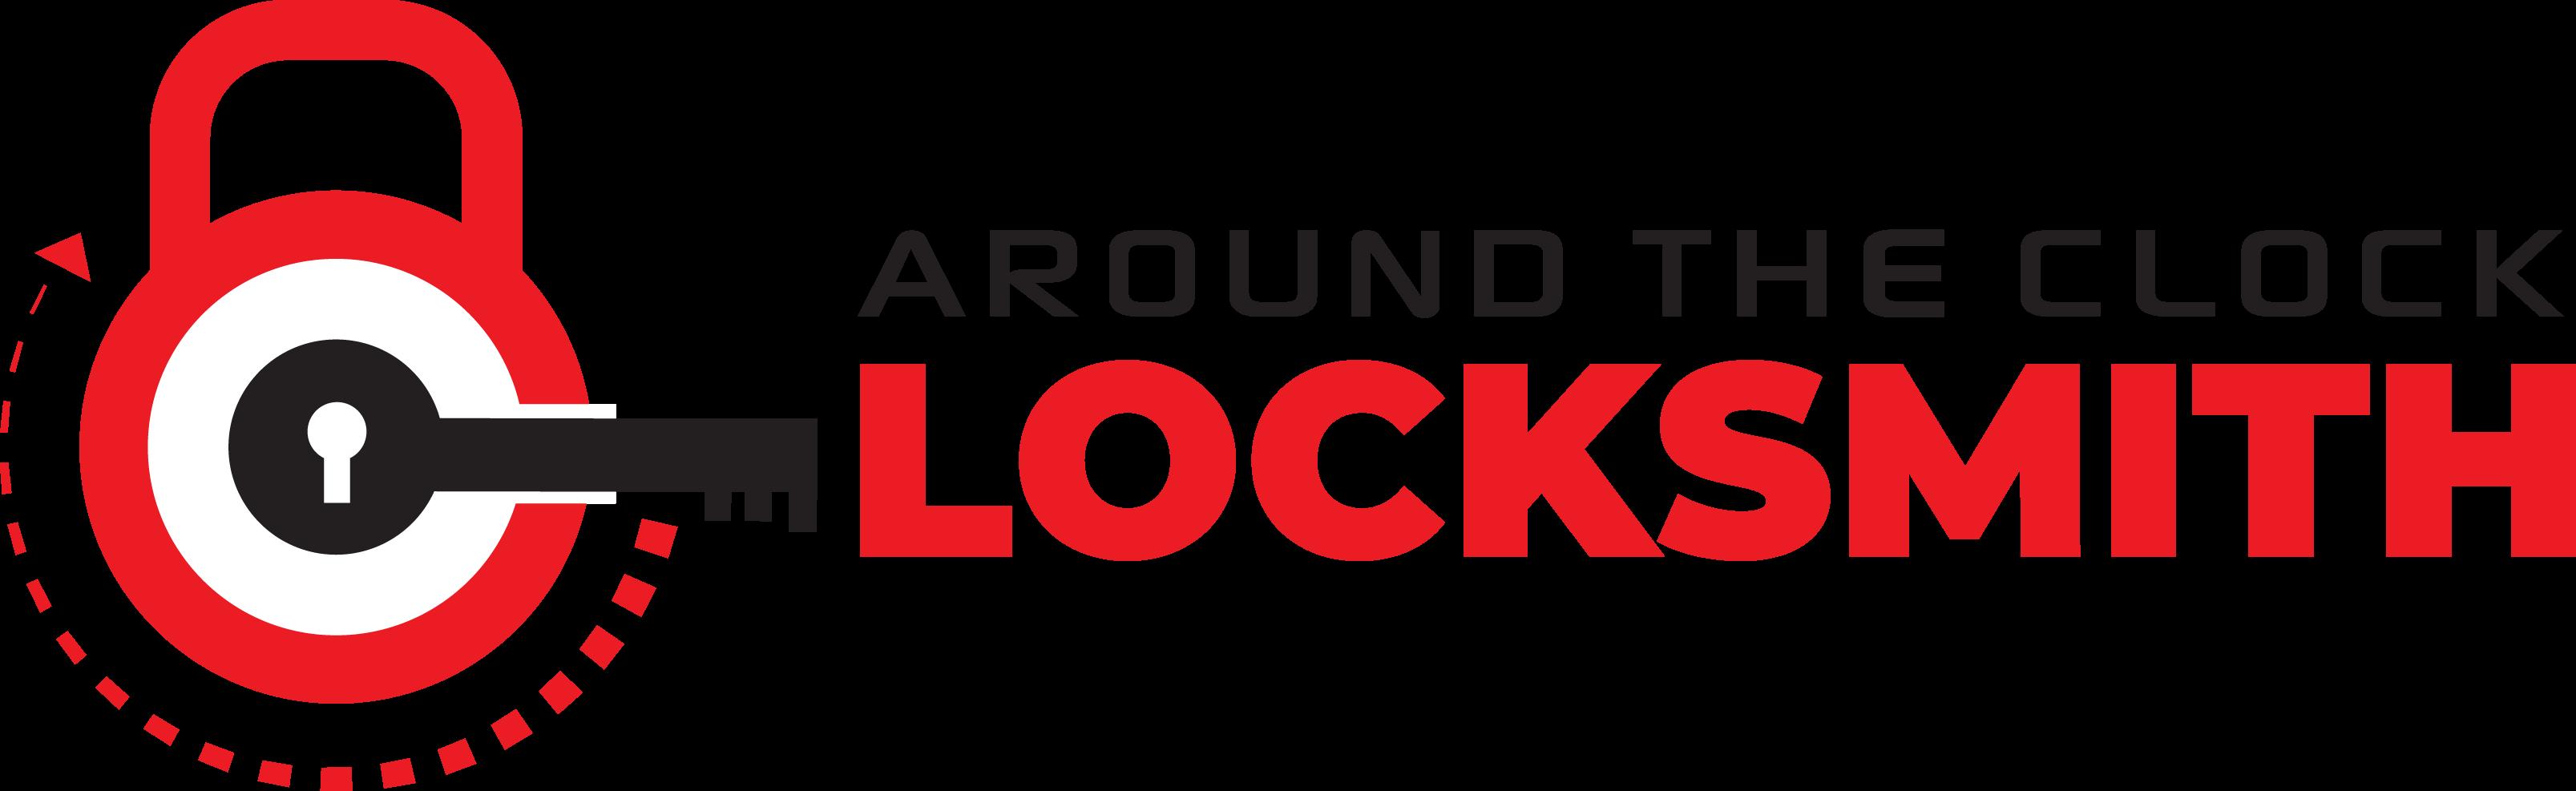 Around The Clock Locksmith